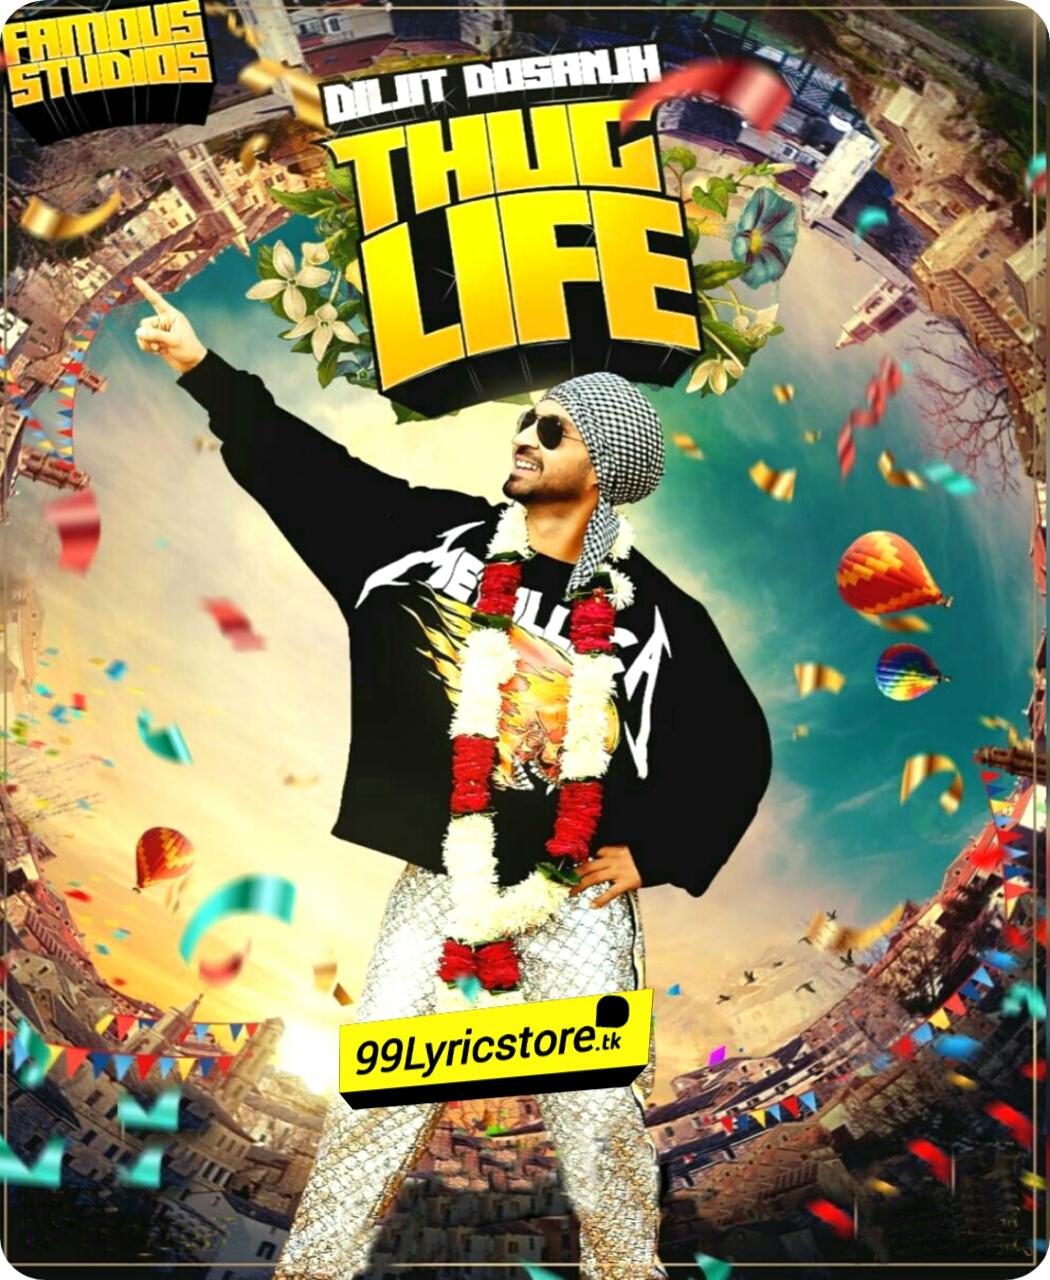 Thug Life Roar Album lyrics,  Diljit Dosanjh New Punjabi Song Lyrics 2018, Diljit Dosanjh Punjabi Song Lyrics, Roar Album Songs Lyrics, Thug Life Song Lyrics, Tere naal Dil la leya Tere shehar naal laiyaan ne garariyaa Lyrics